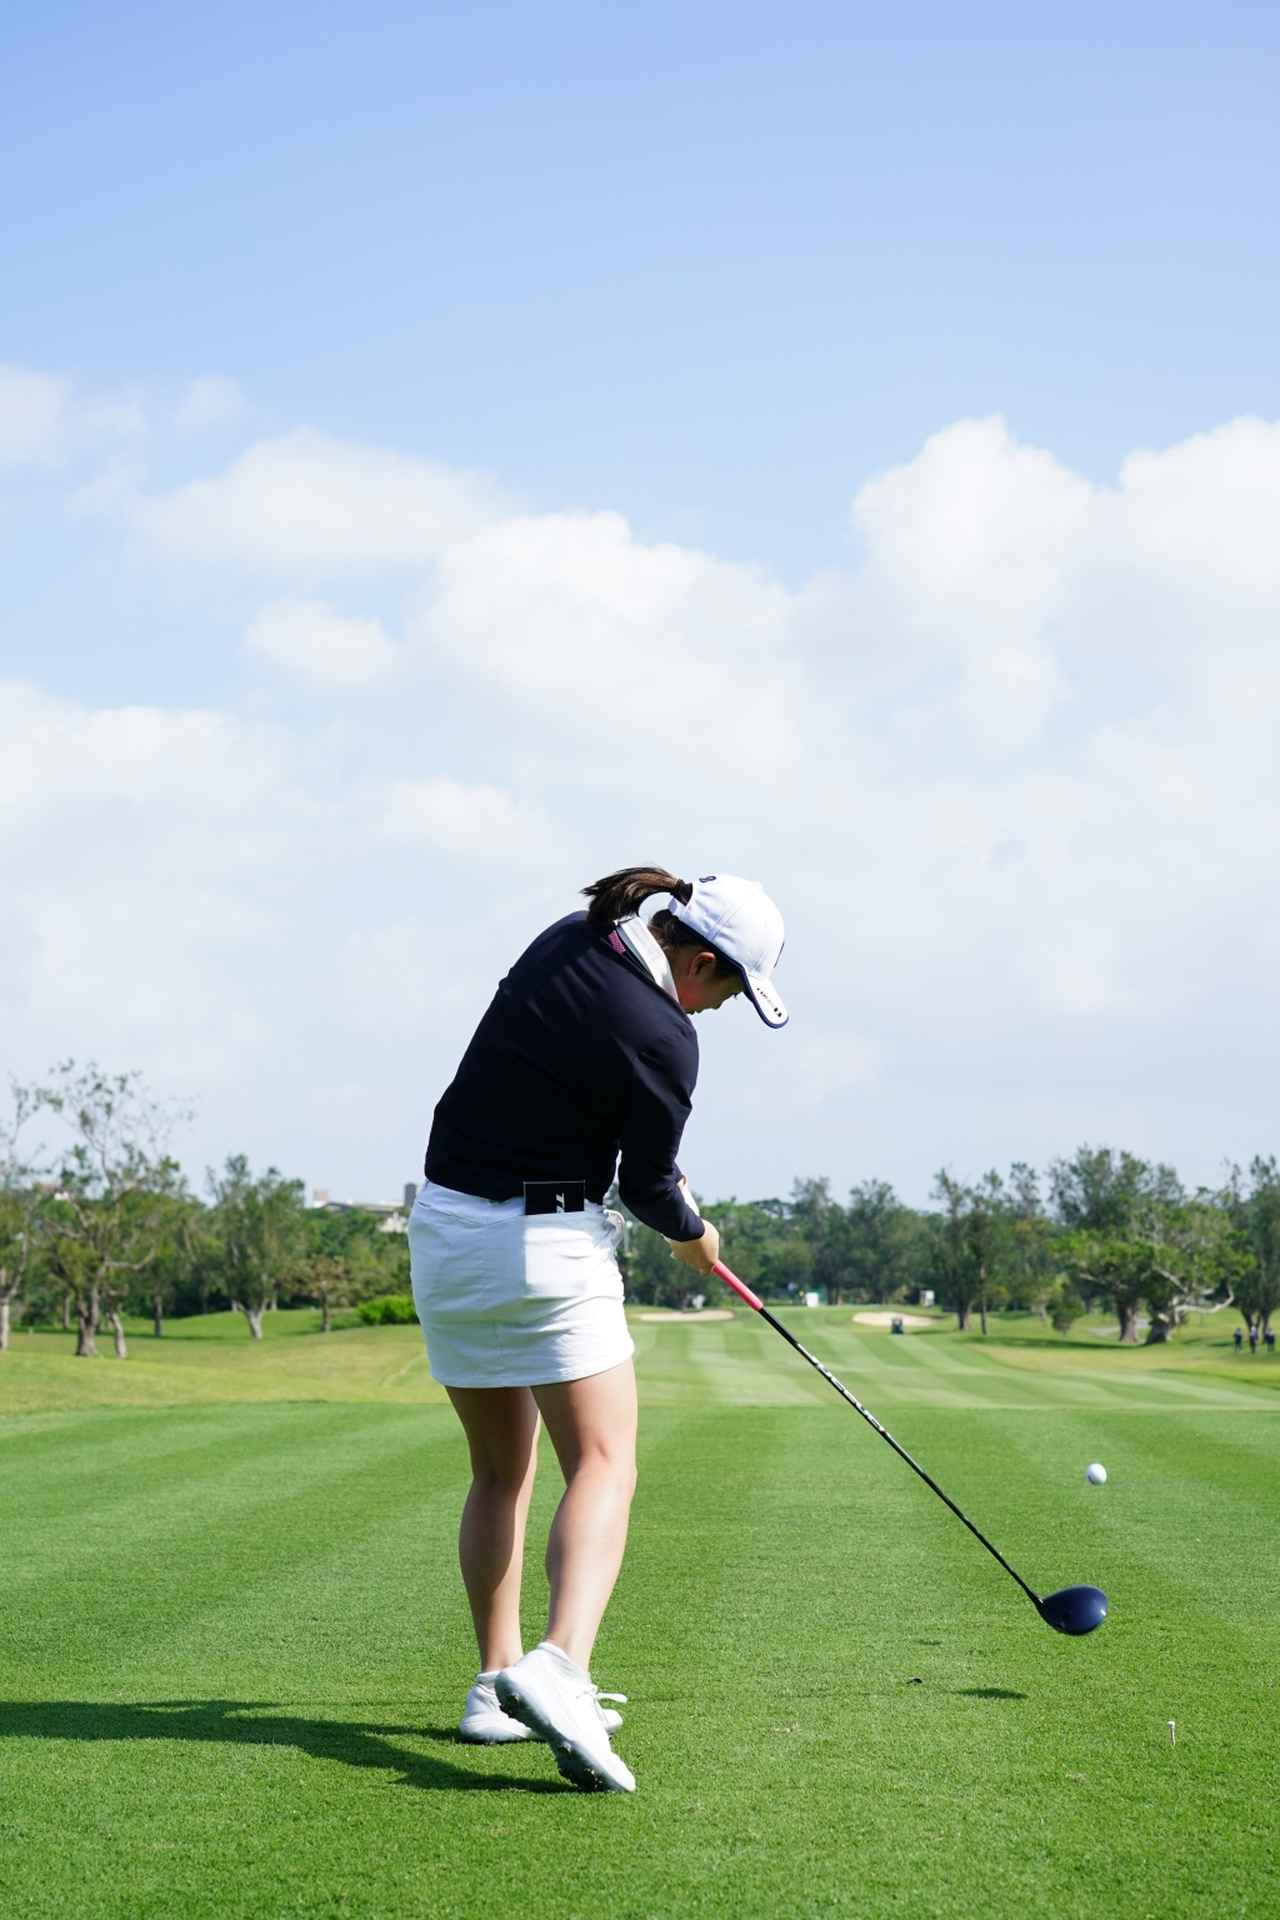 Images : 14番目の画像 - 丹萌乃のドライバー連続写真 - みんなのゴルフダイジェスト